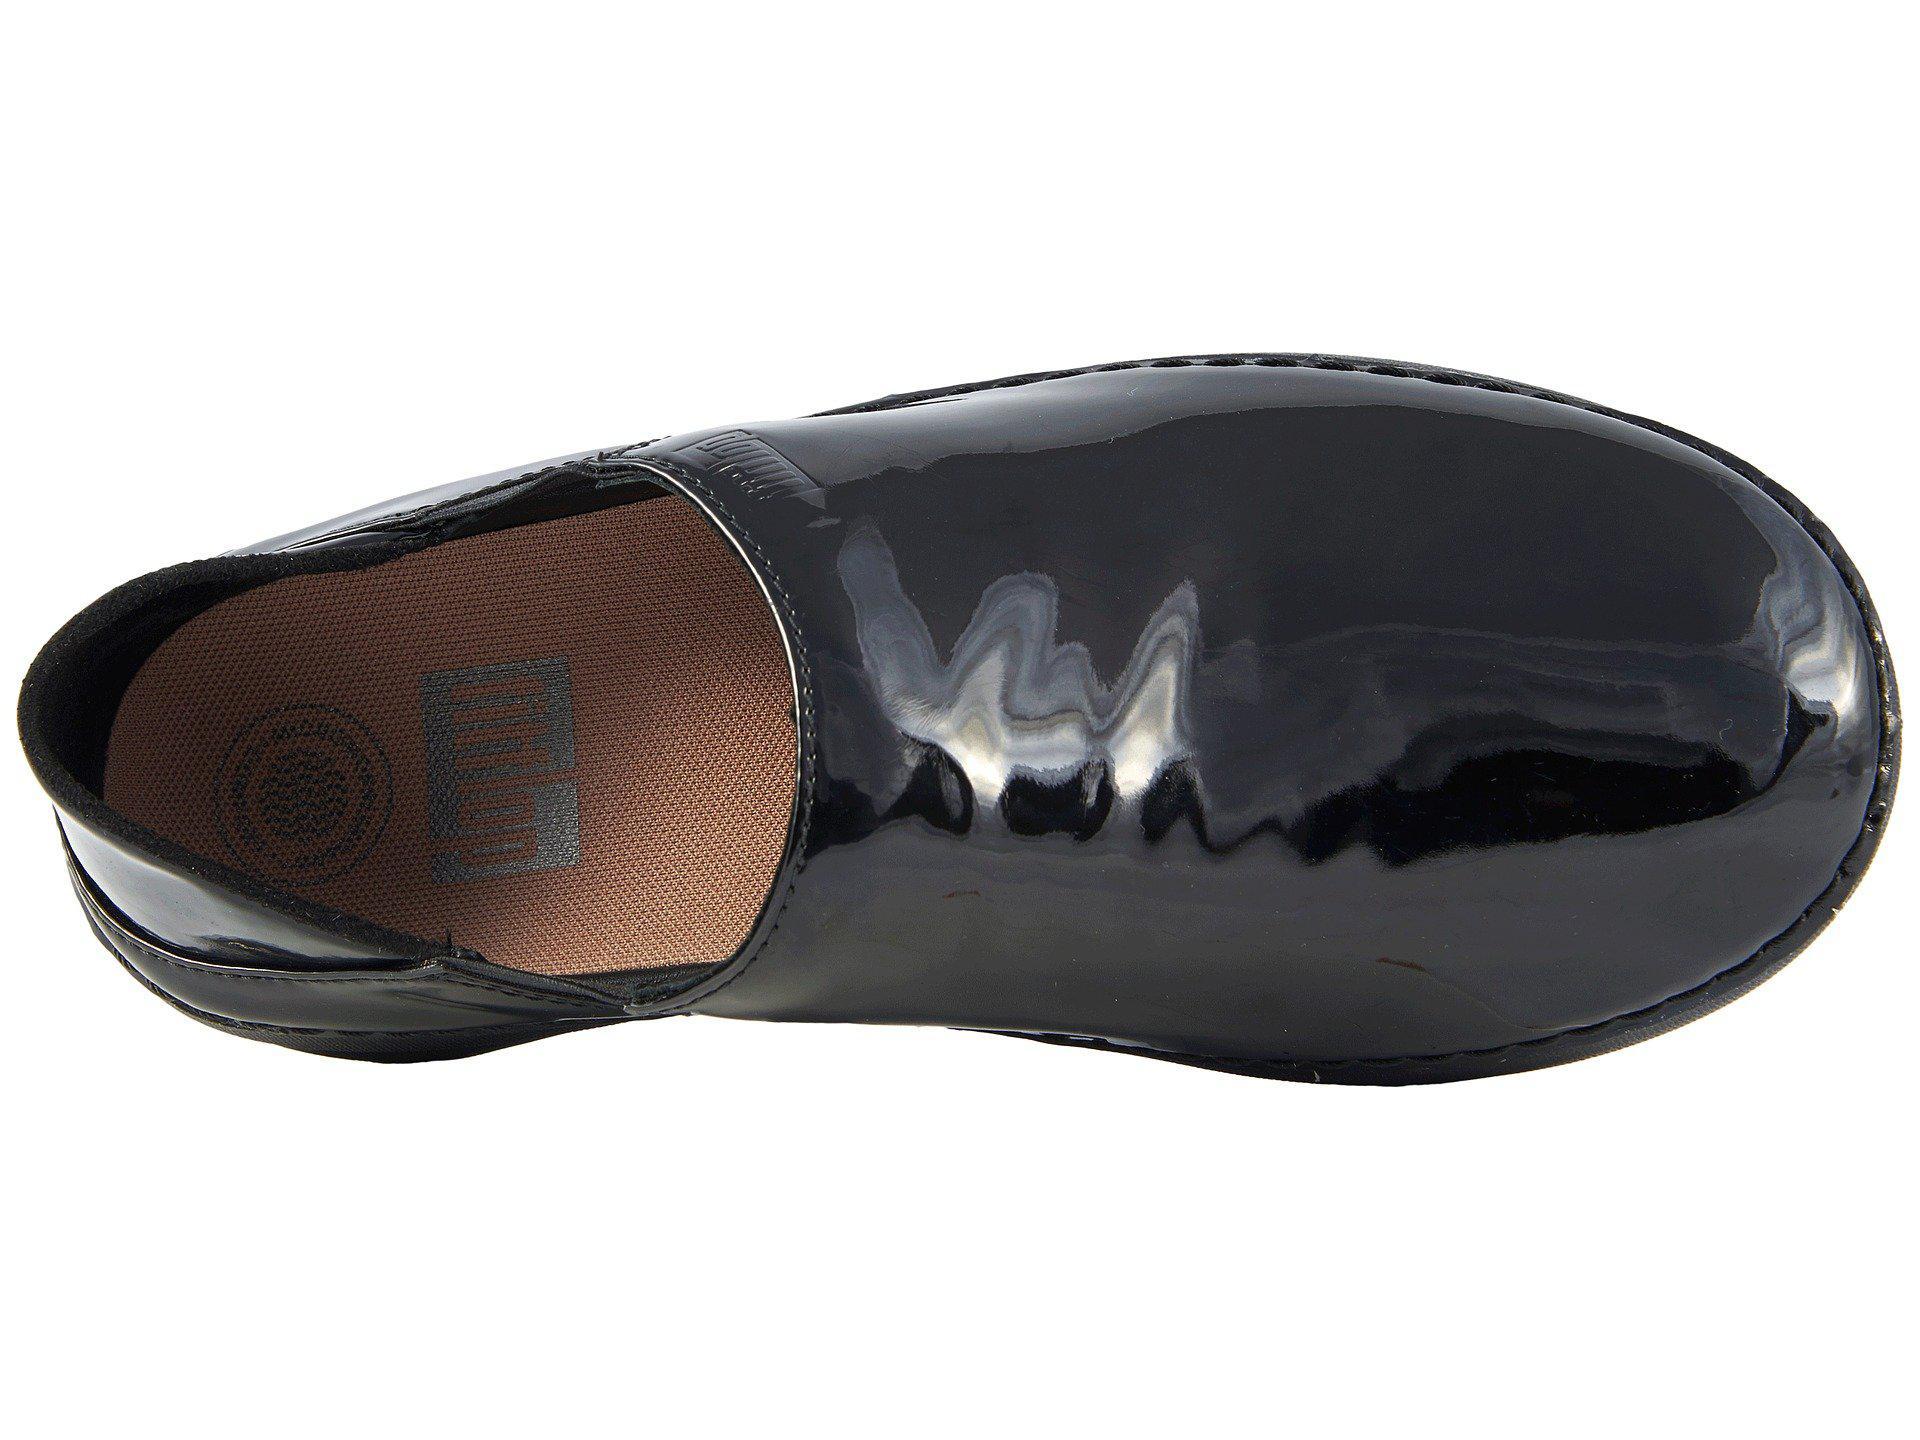 b20ca448aeeb Fitflop - Superloafer Patent (black) Women s Slip On Shoes - Lyst. View  fullscreen